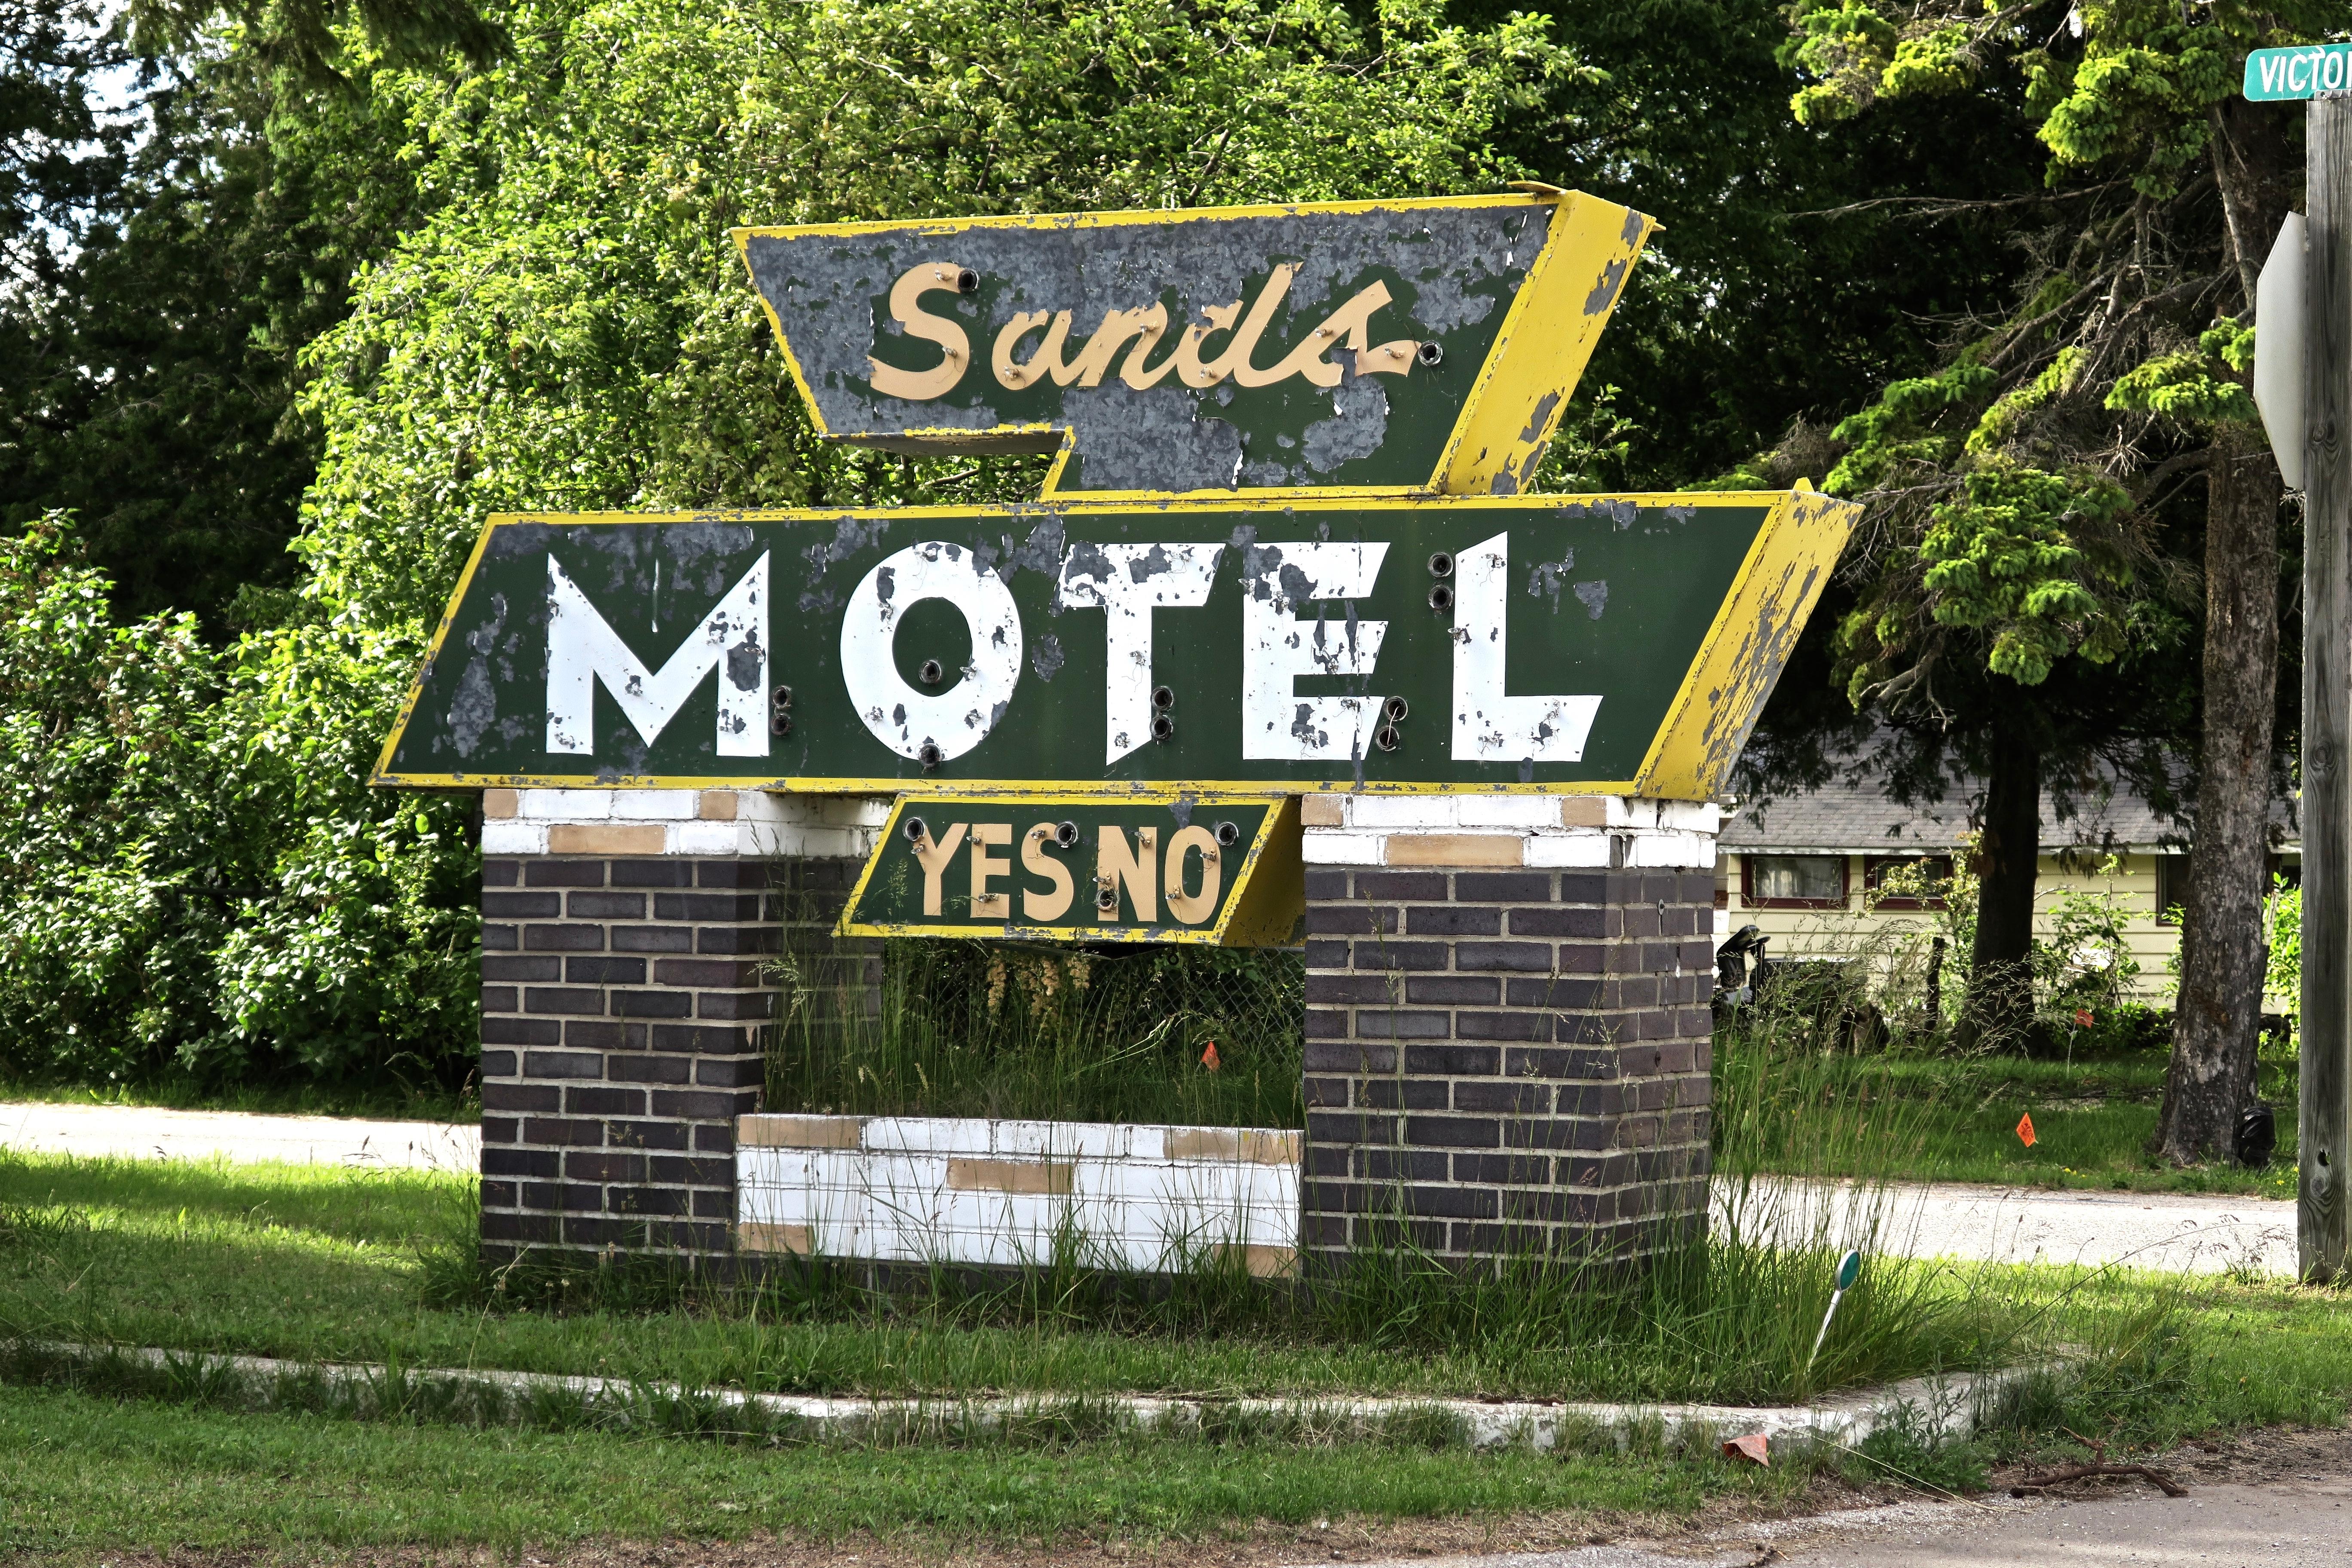 Sands Motel - Saint Ignace, Michigan U.S.A. - July 1, 2017